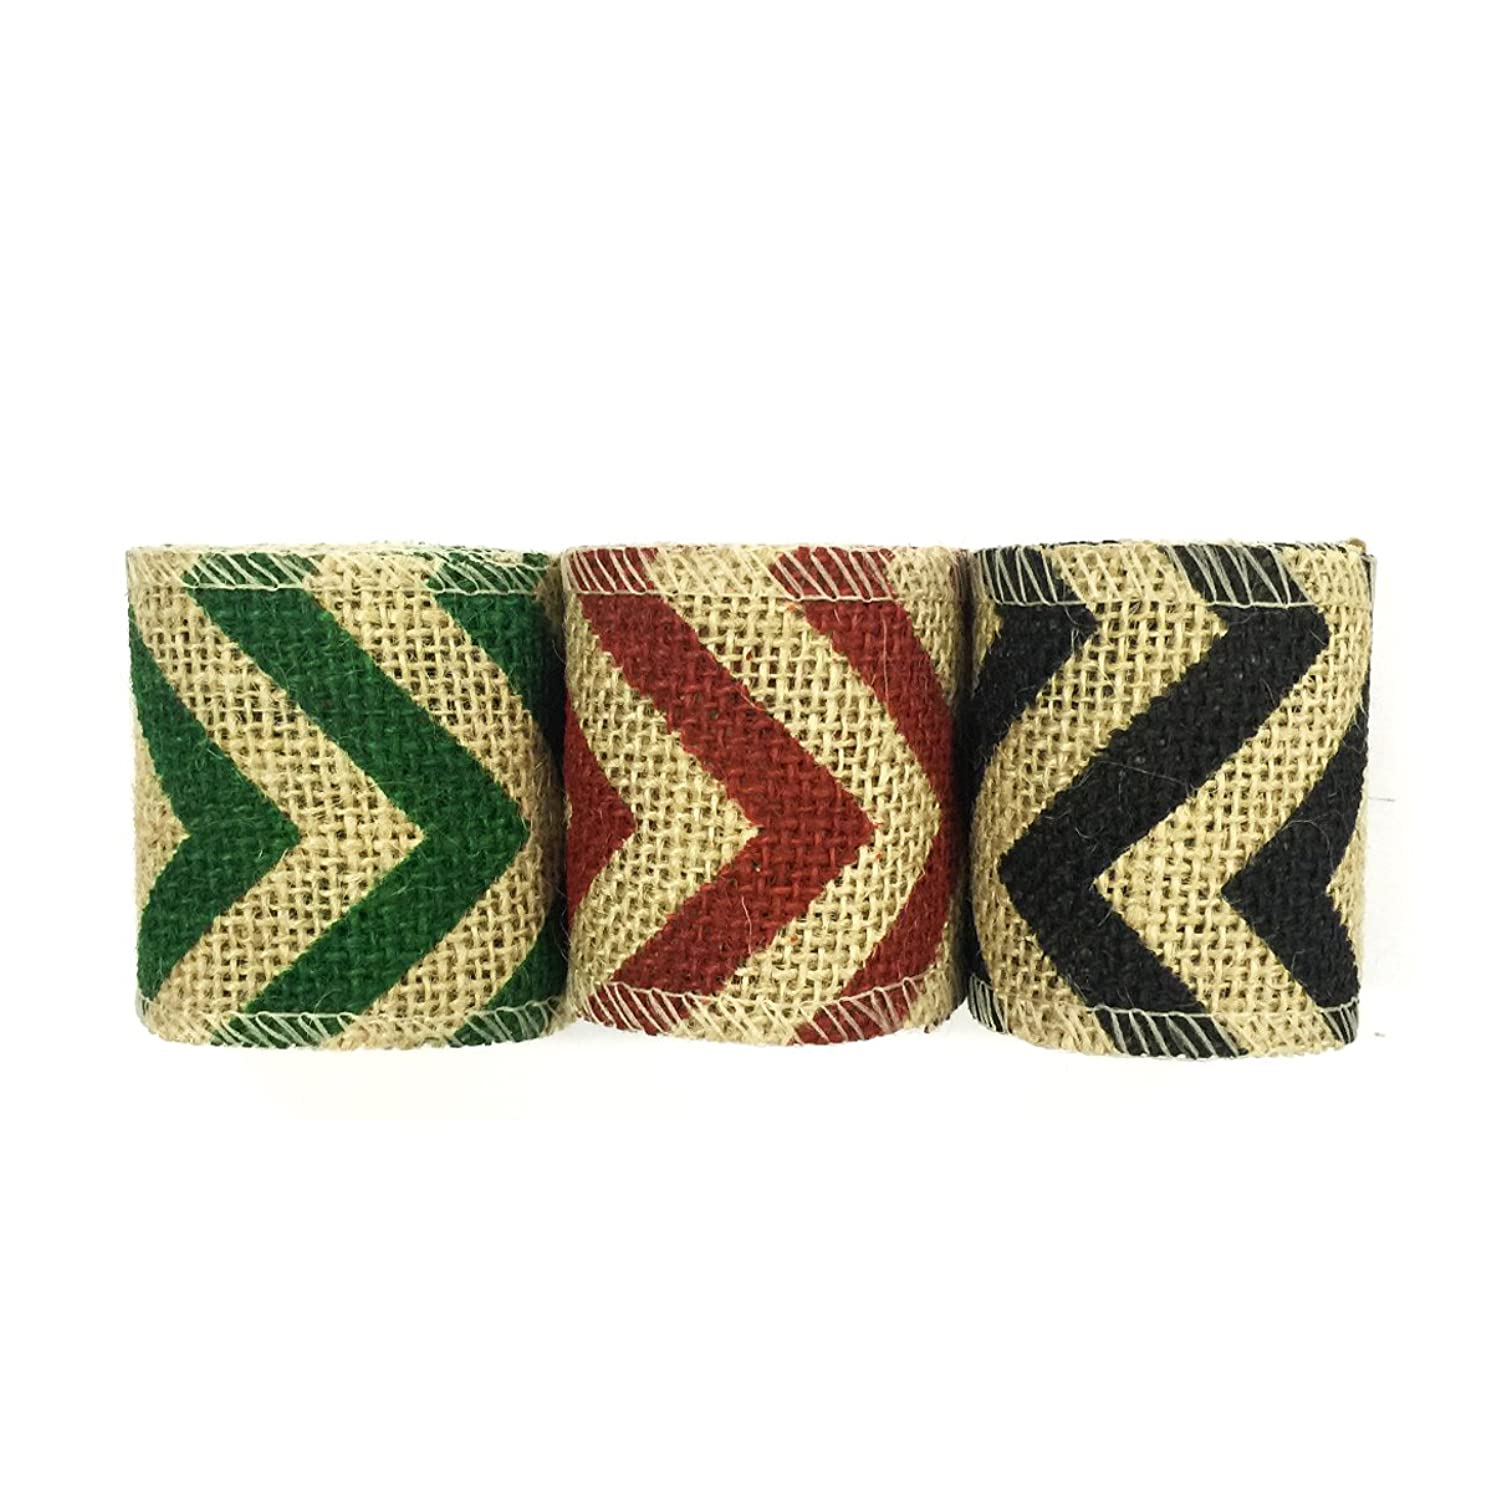 Wrapables Chevron Burlap Ribbon 2.5 Inch Width x 2 Yards Length (Set of 3), Black/Red/Green